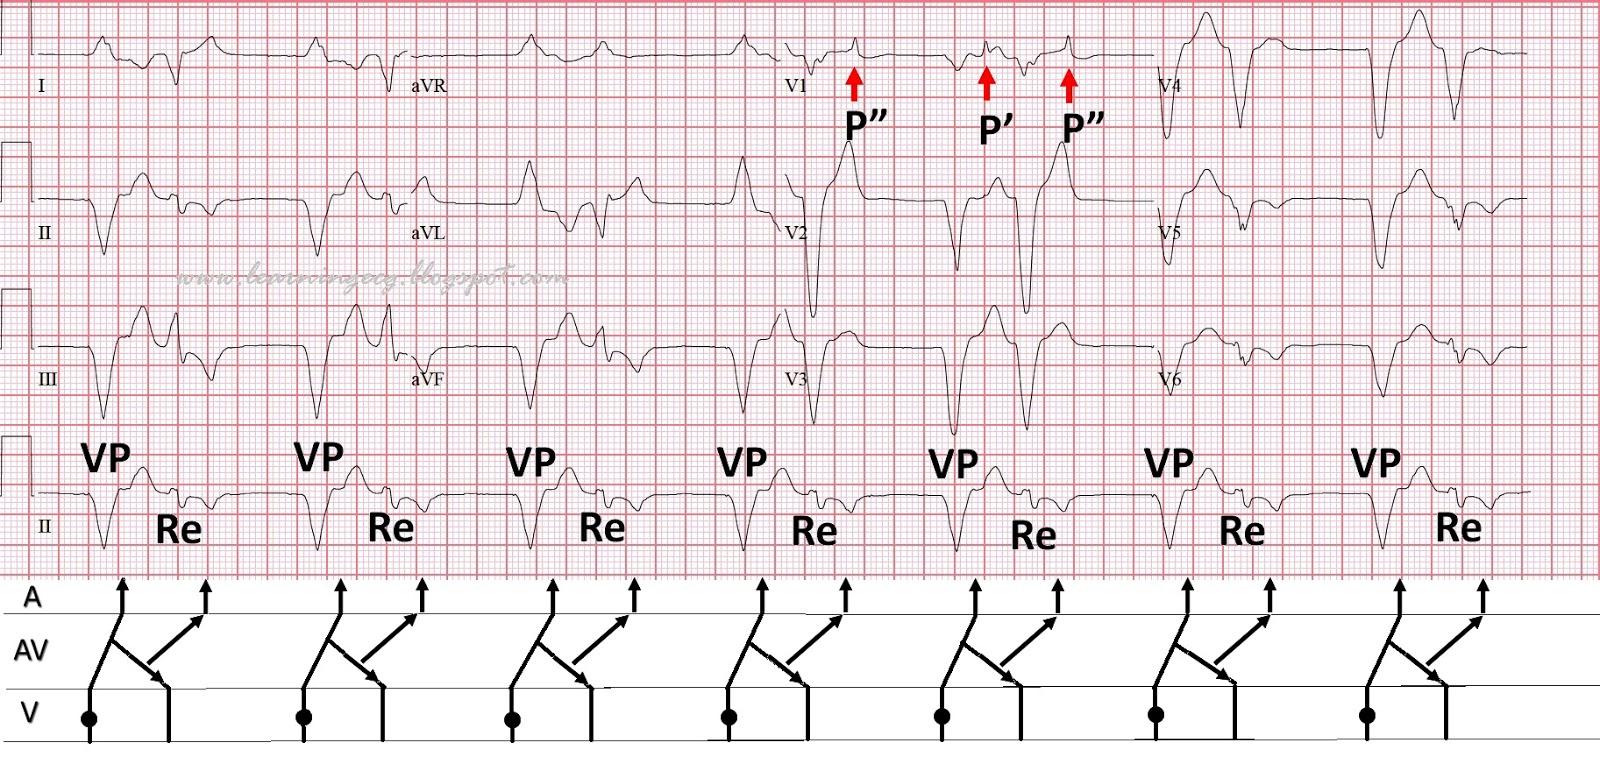 Ecg rhythms reciprocal beating in a paced rhythm figure 2 ladder diagram ccuart Choice Image